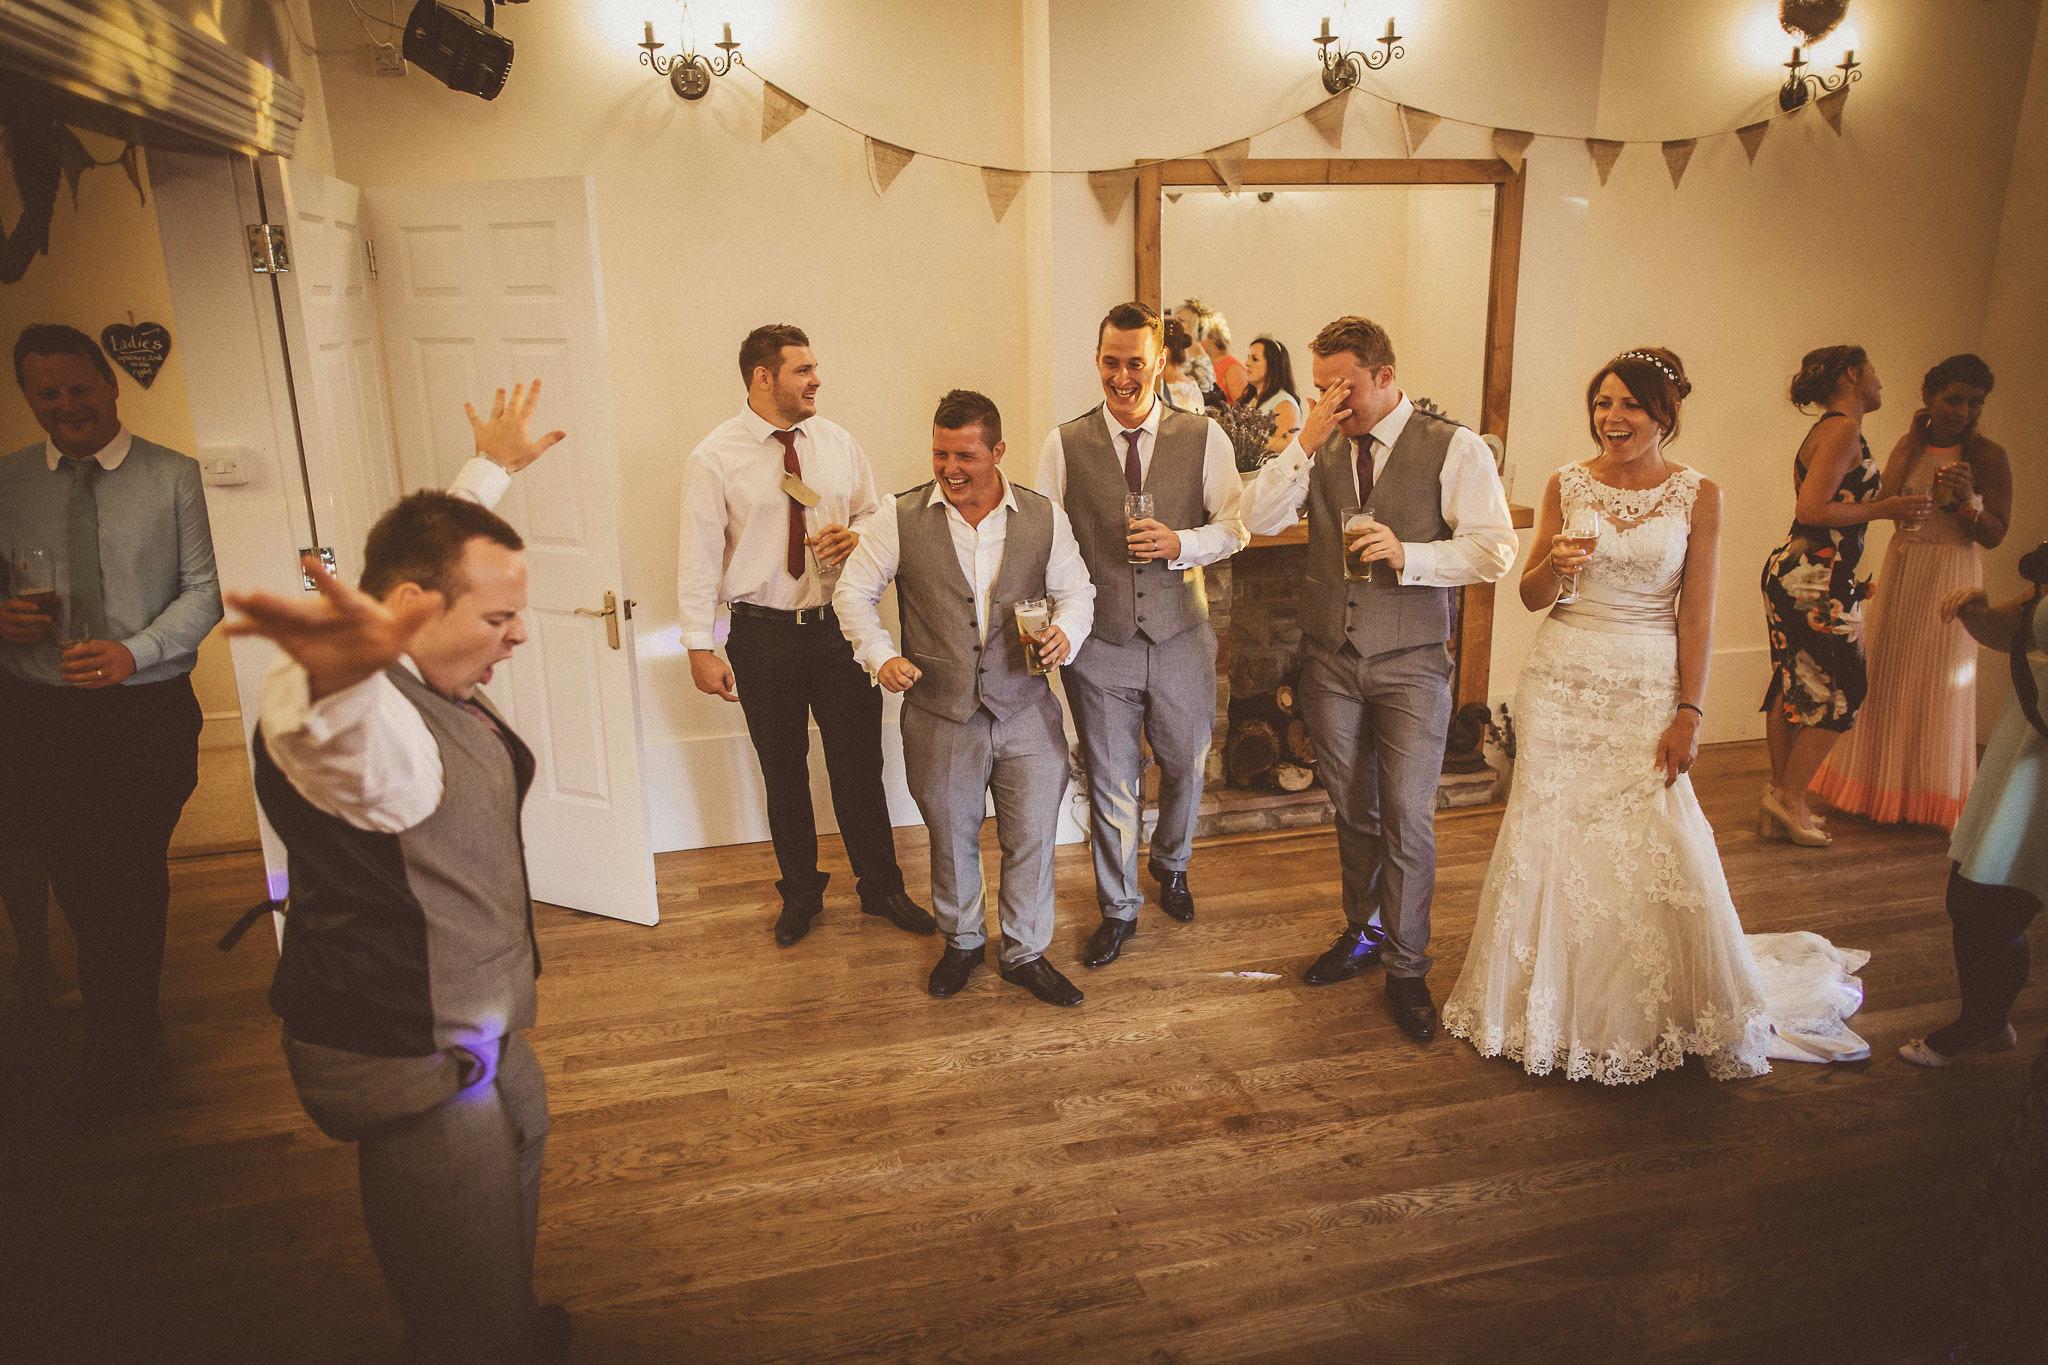 paul-marbrook-Caer-Llan-Wedding-Photographer-90093